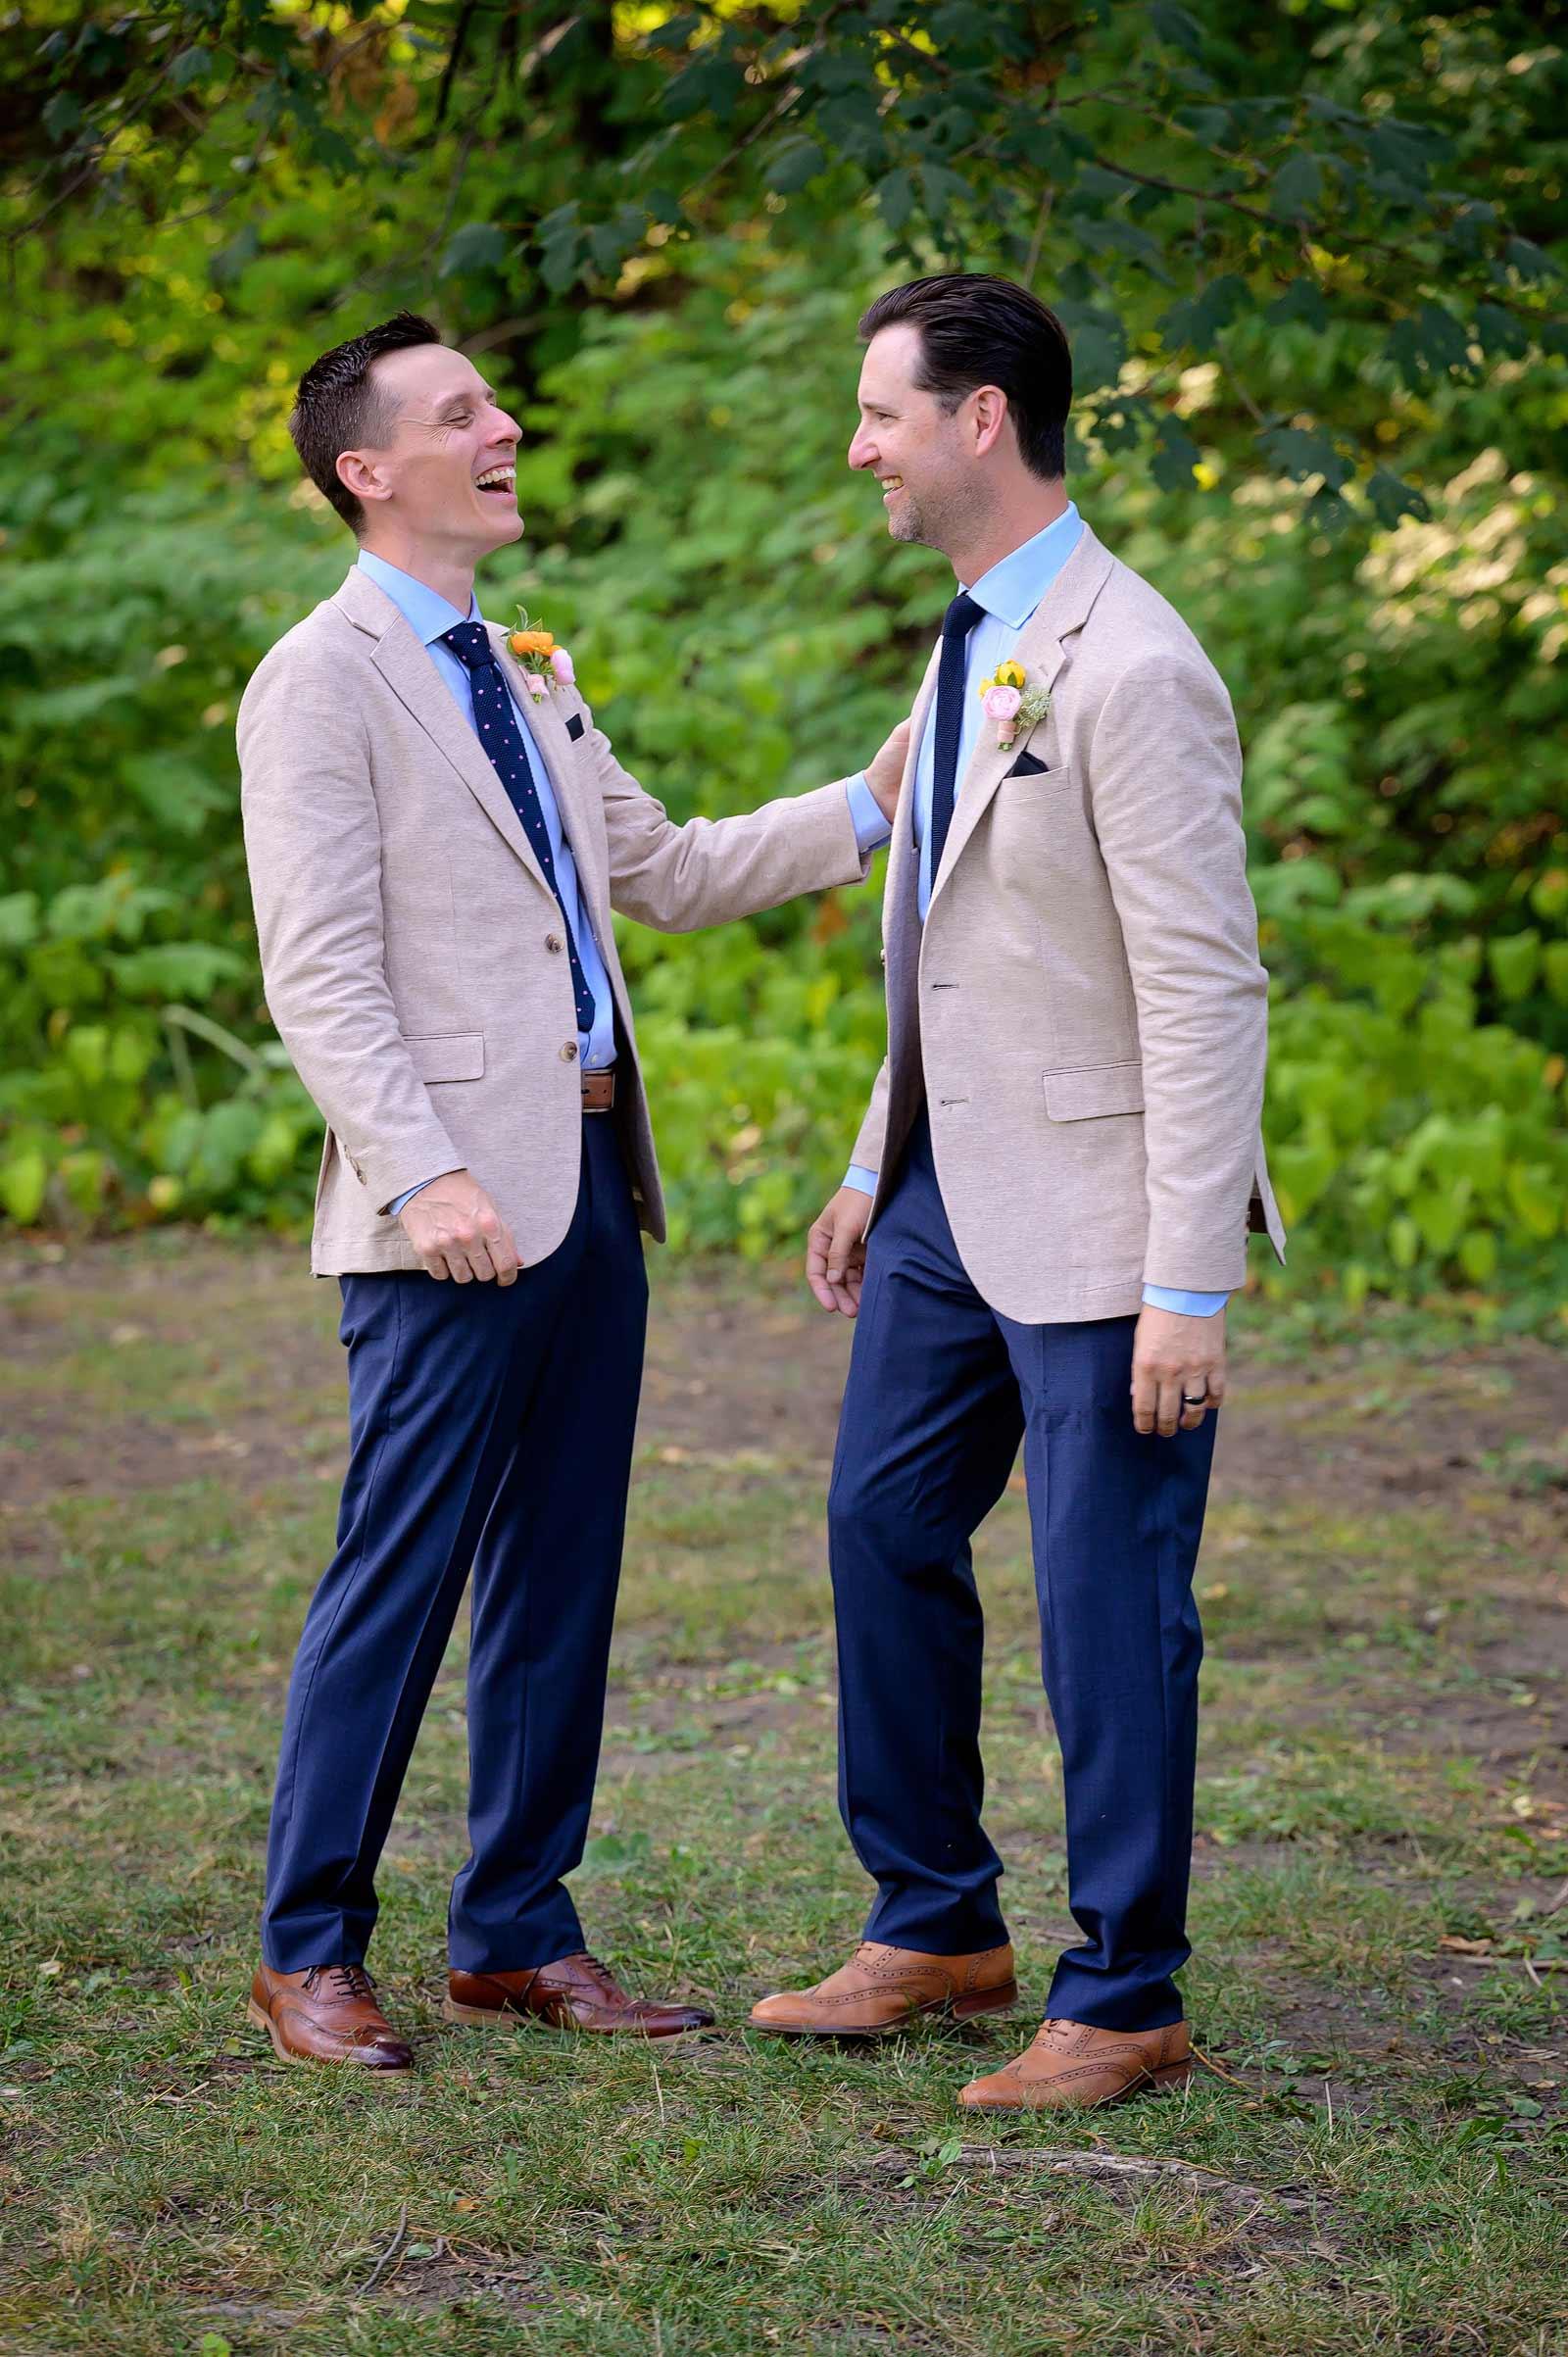 rebeccatrevor-wedding-sneakpeek-15